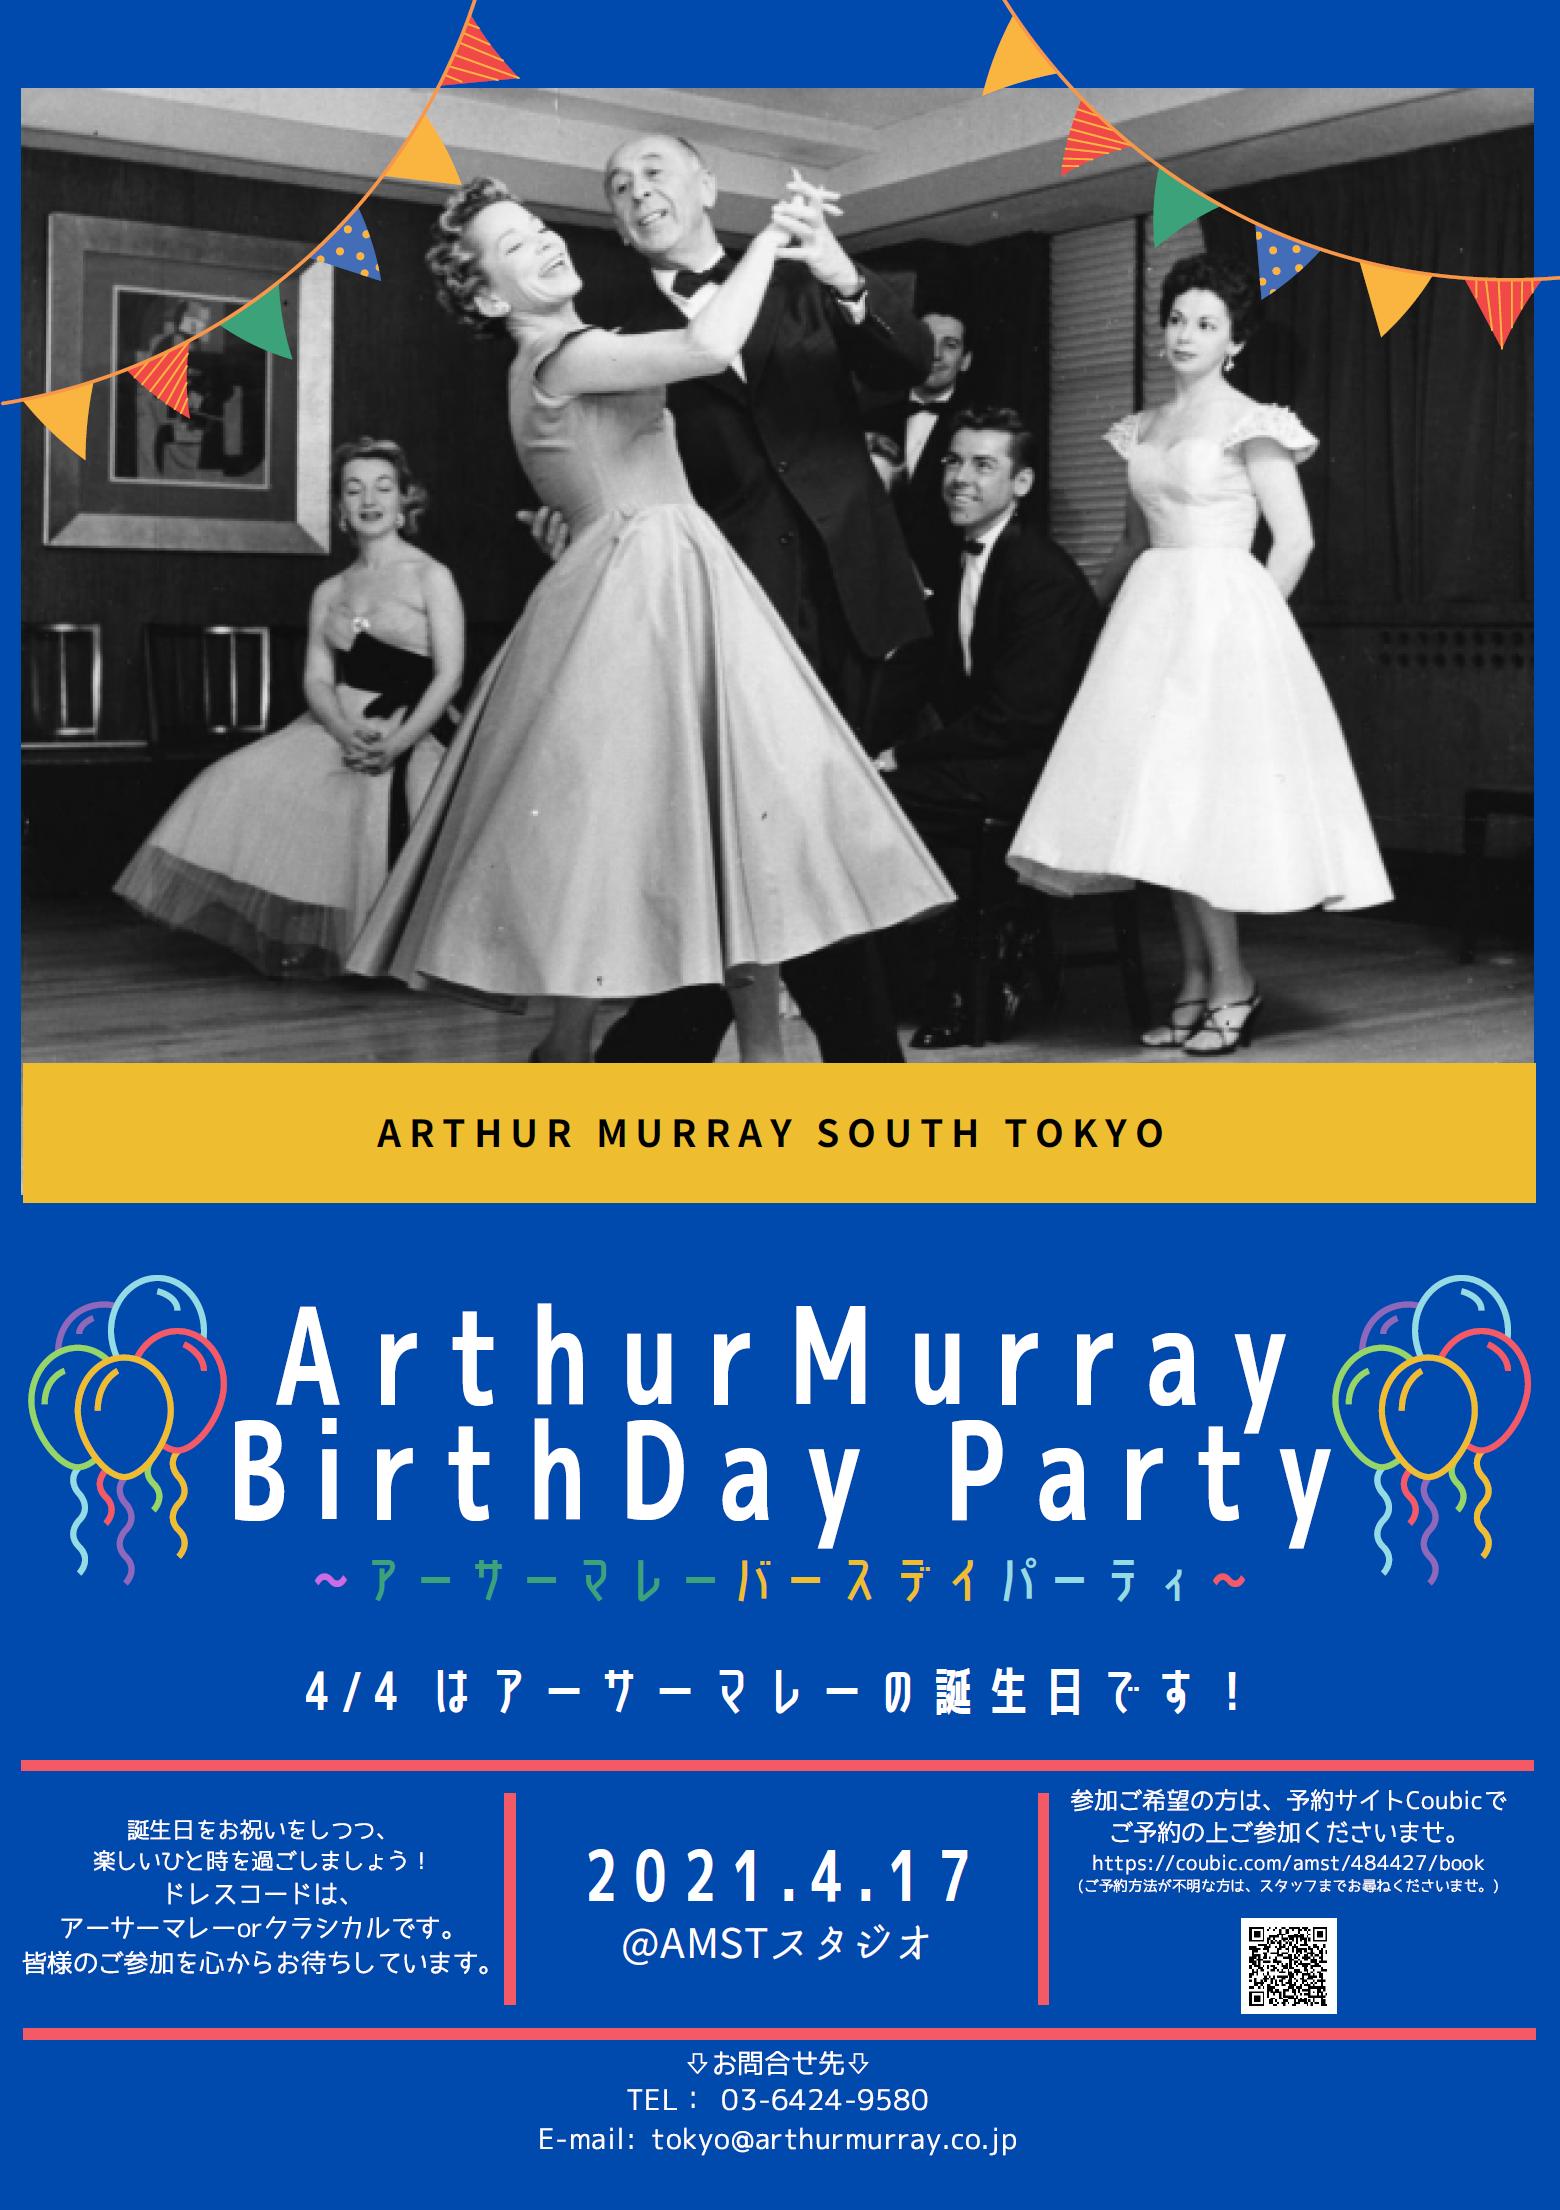 『ArthurMurray BirthDay Party』